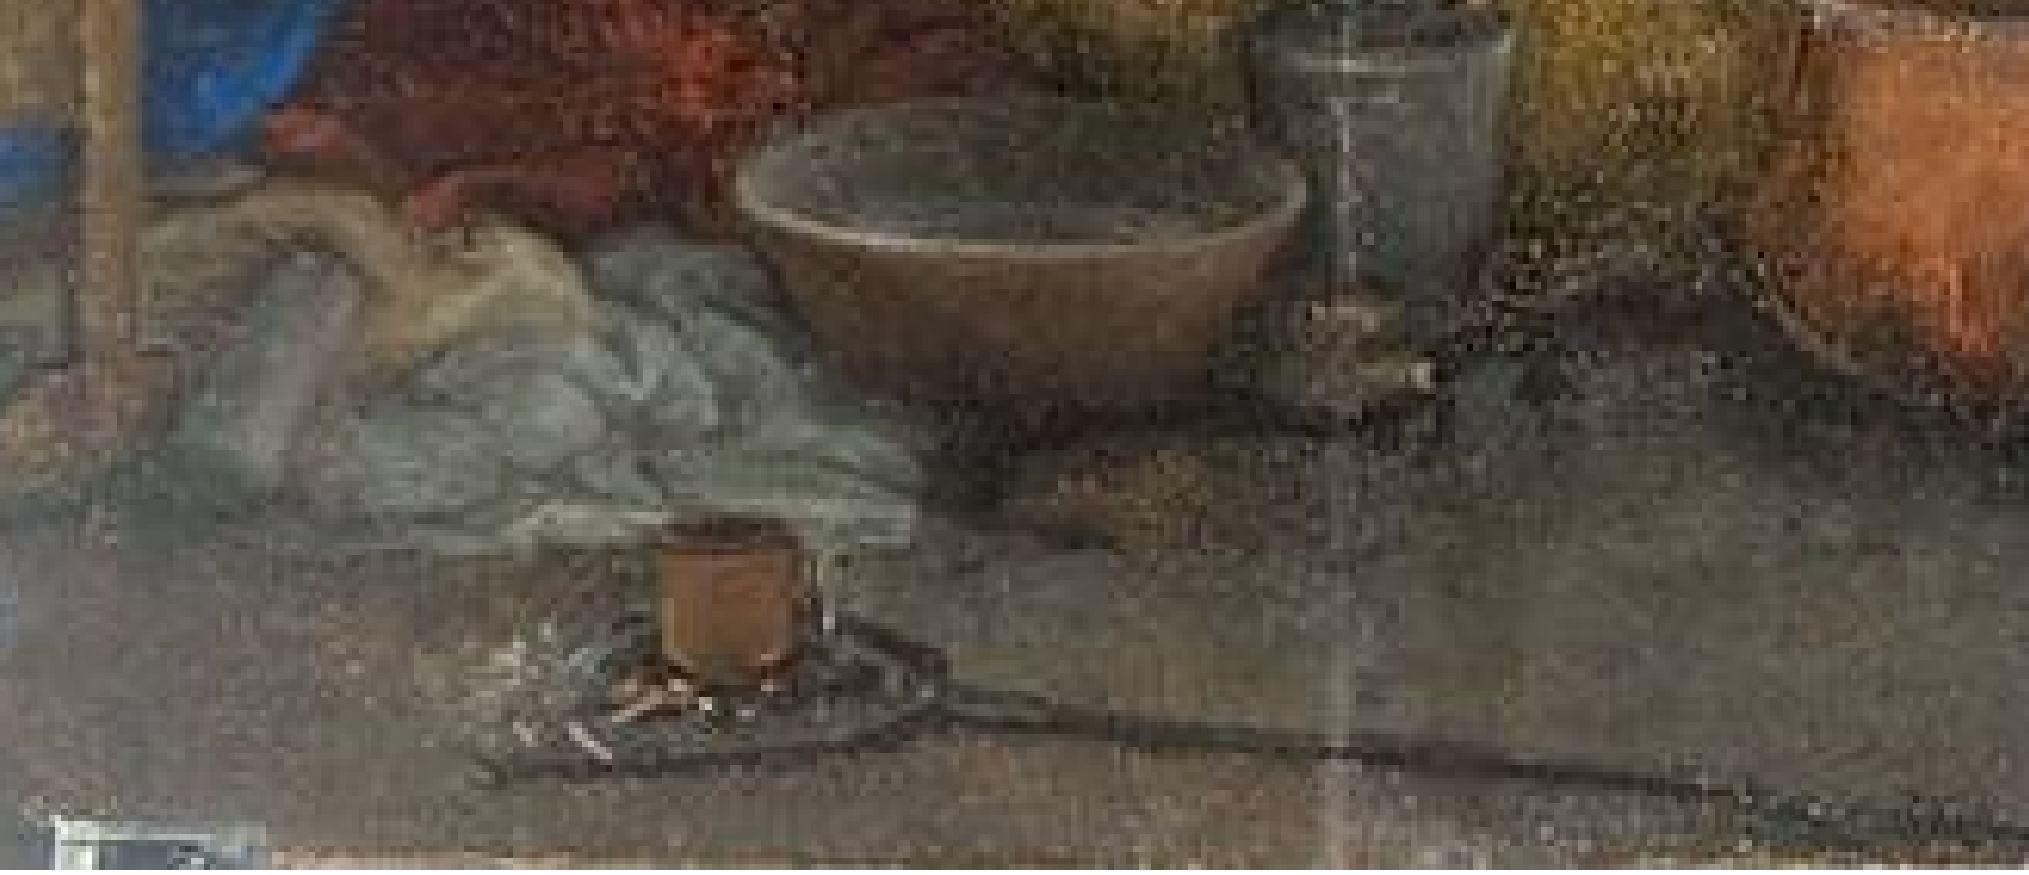 Lotto 1527-28 Nativita Pinacoteca Nazionale Sienne detail pelle